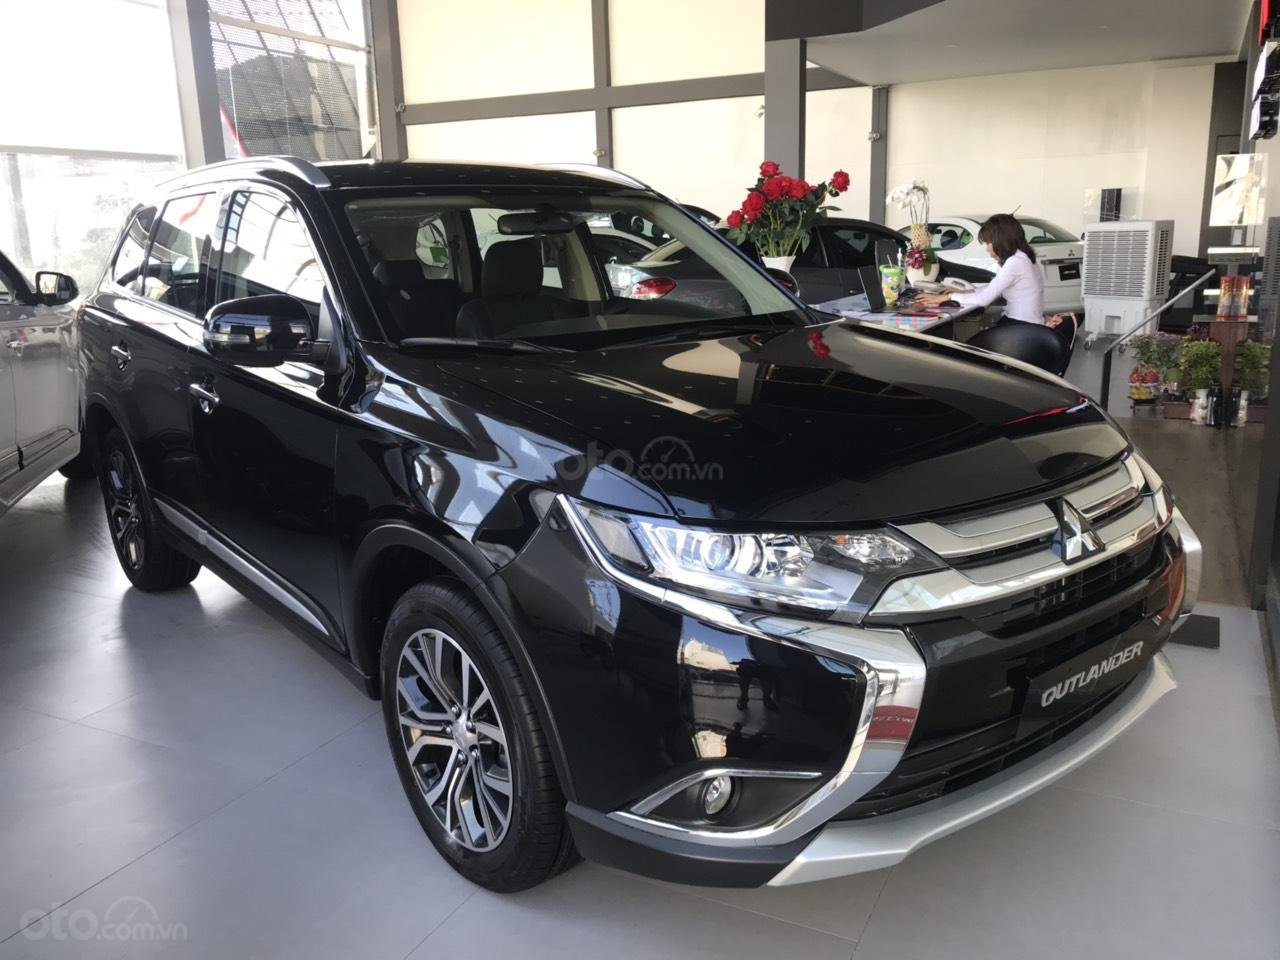 Mitsubishi Isamco Bình Triệu (15)